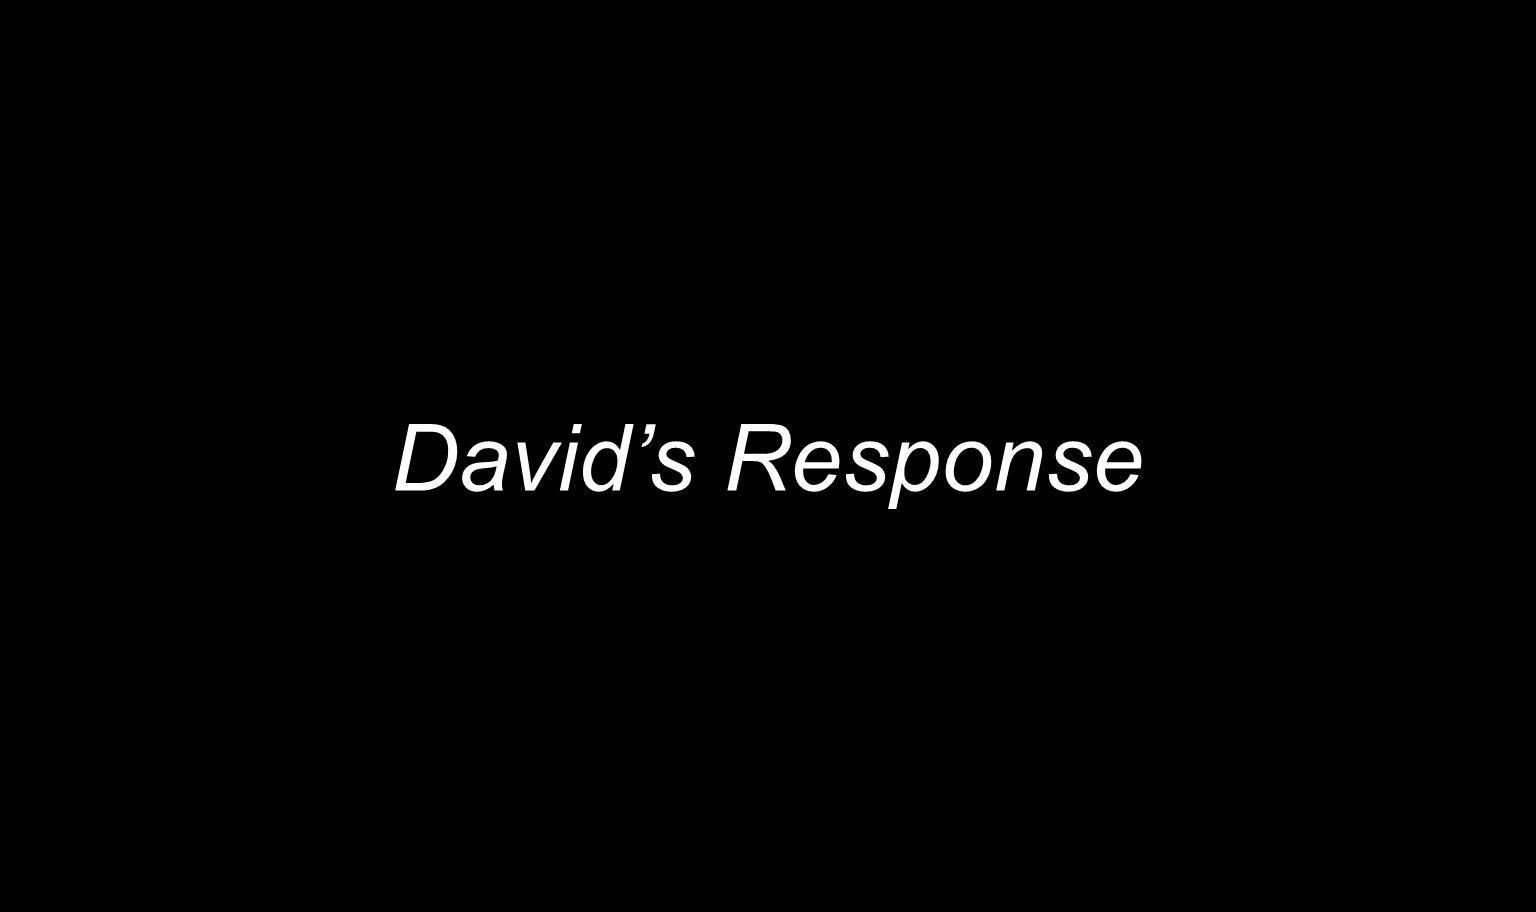 Davids Response